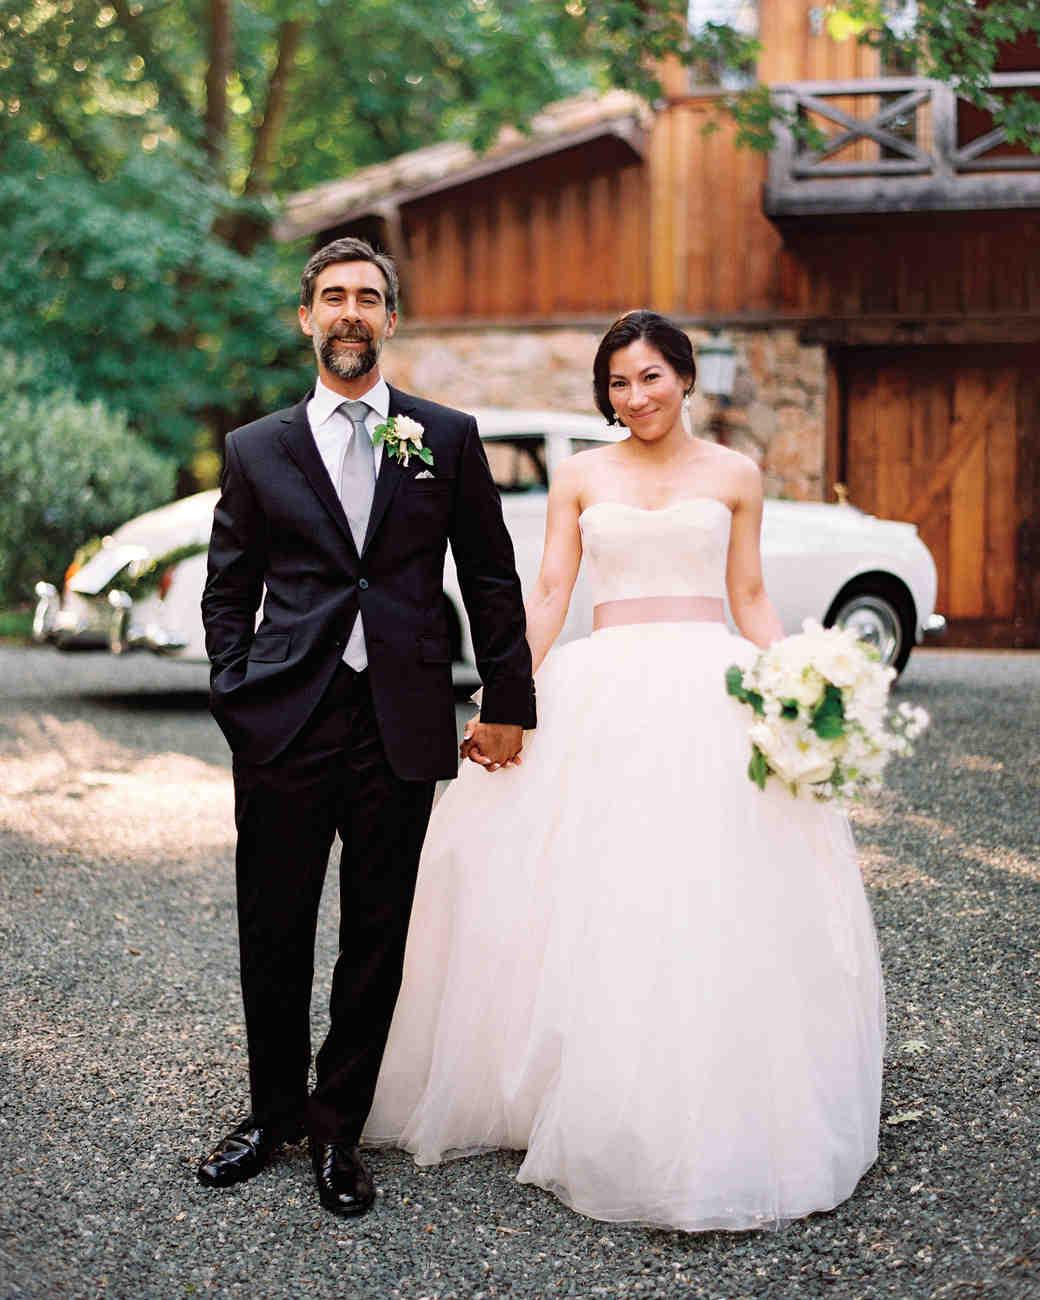 marilyn-harold-couple-008847-007-mwds109987.jpg